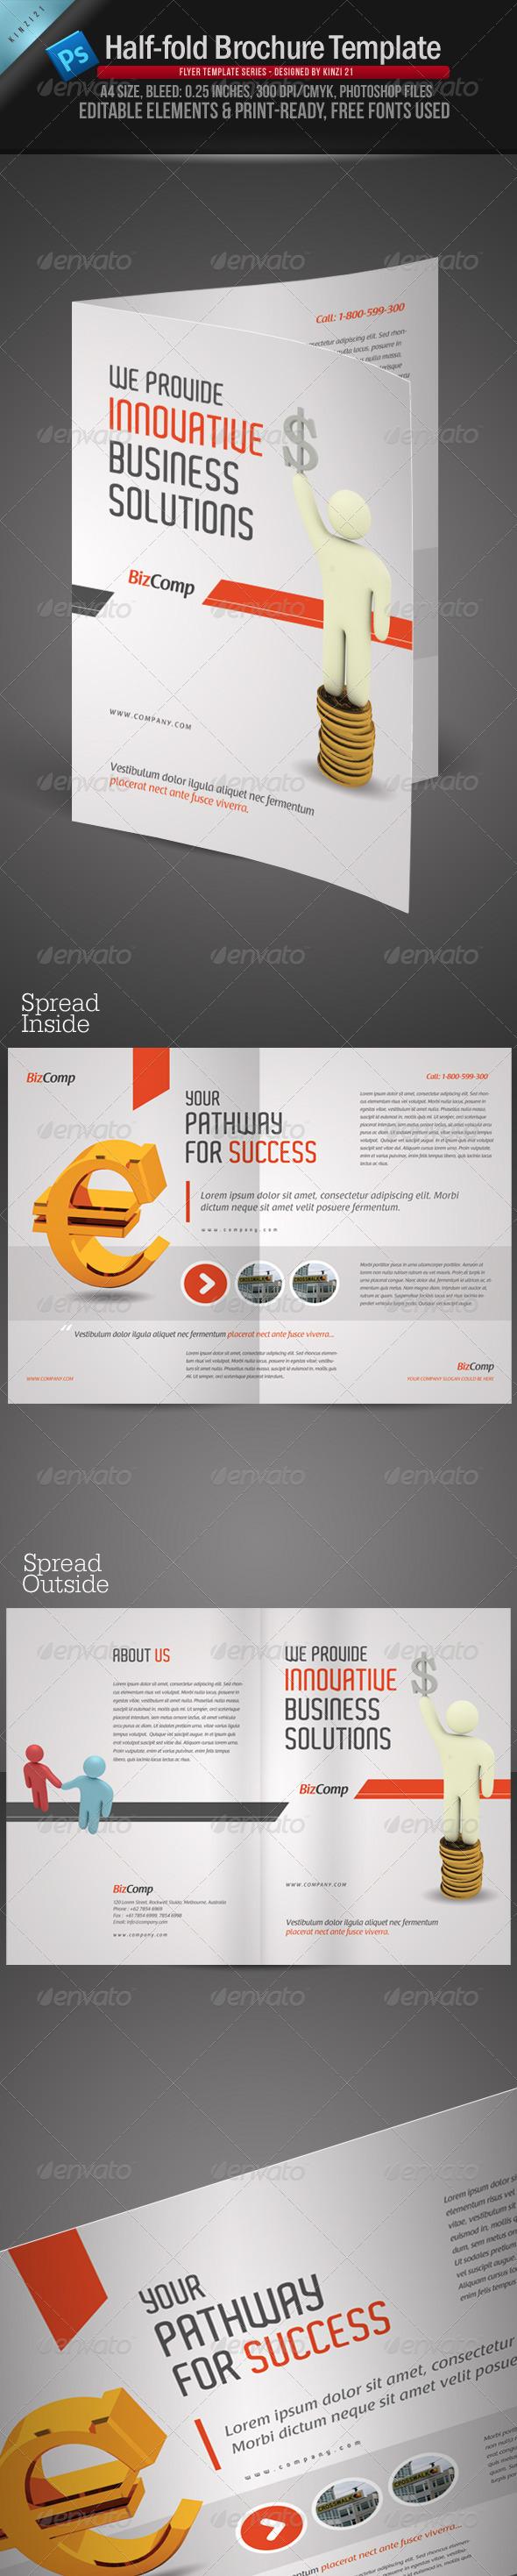 2 fold brochure template photoshop - a4 half fold brochure template graphicriver